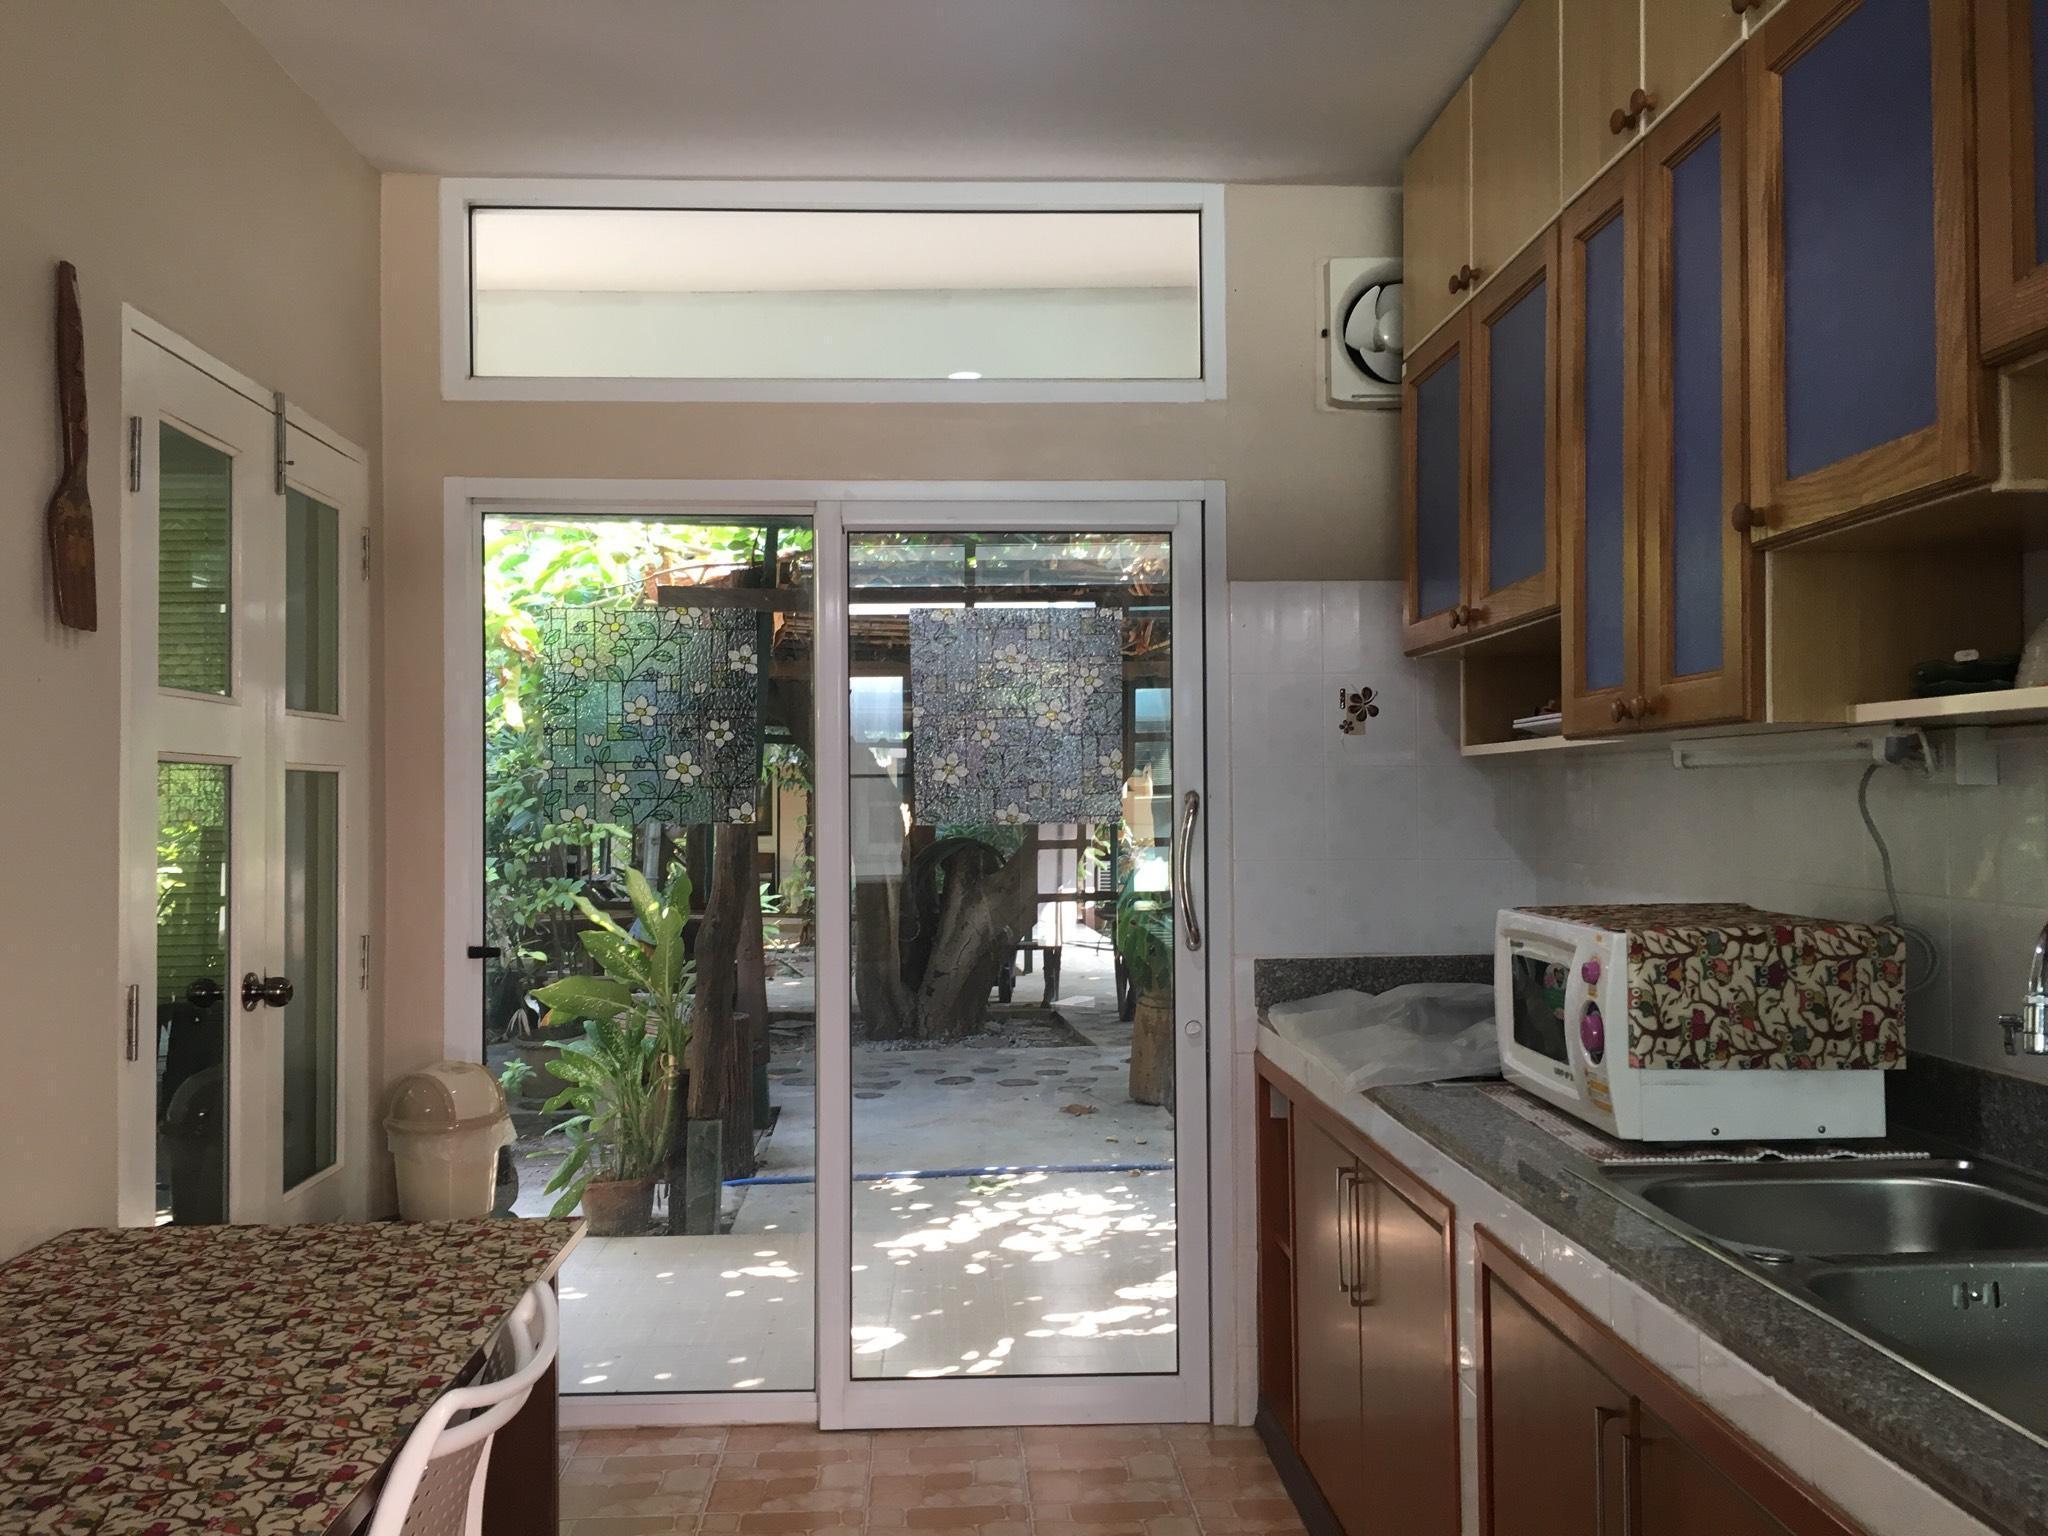 Casa bonita บ้านเดี่ยว 1 ห้องนอน 1 ห้องน้ำส่วนตัว ขนาด 50 ตร.ม. – ริเวอร์ไซด์